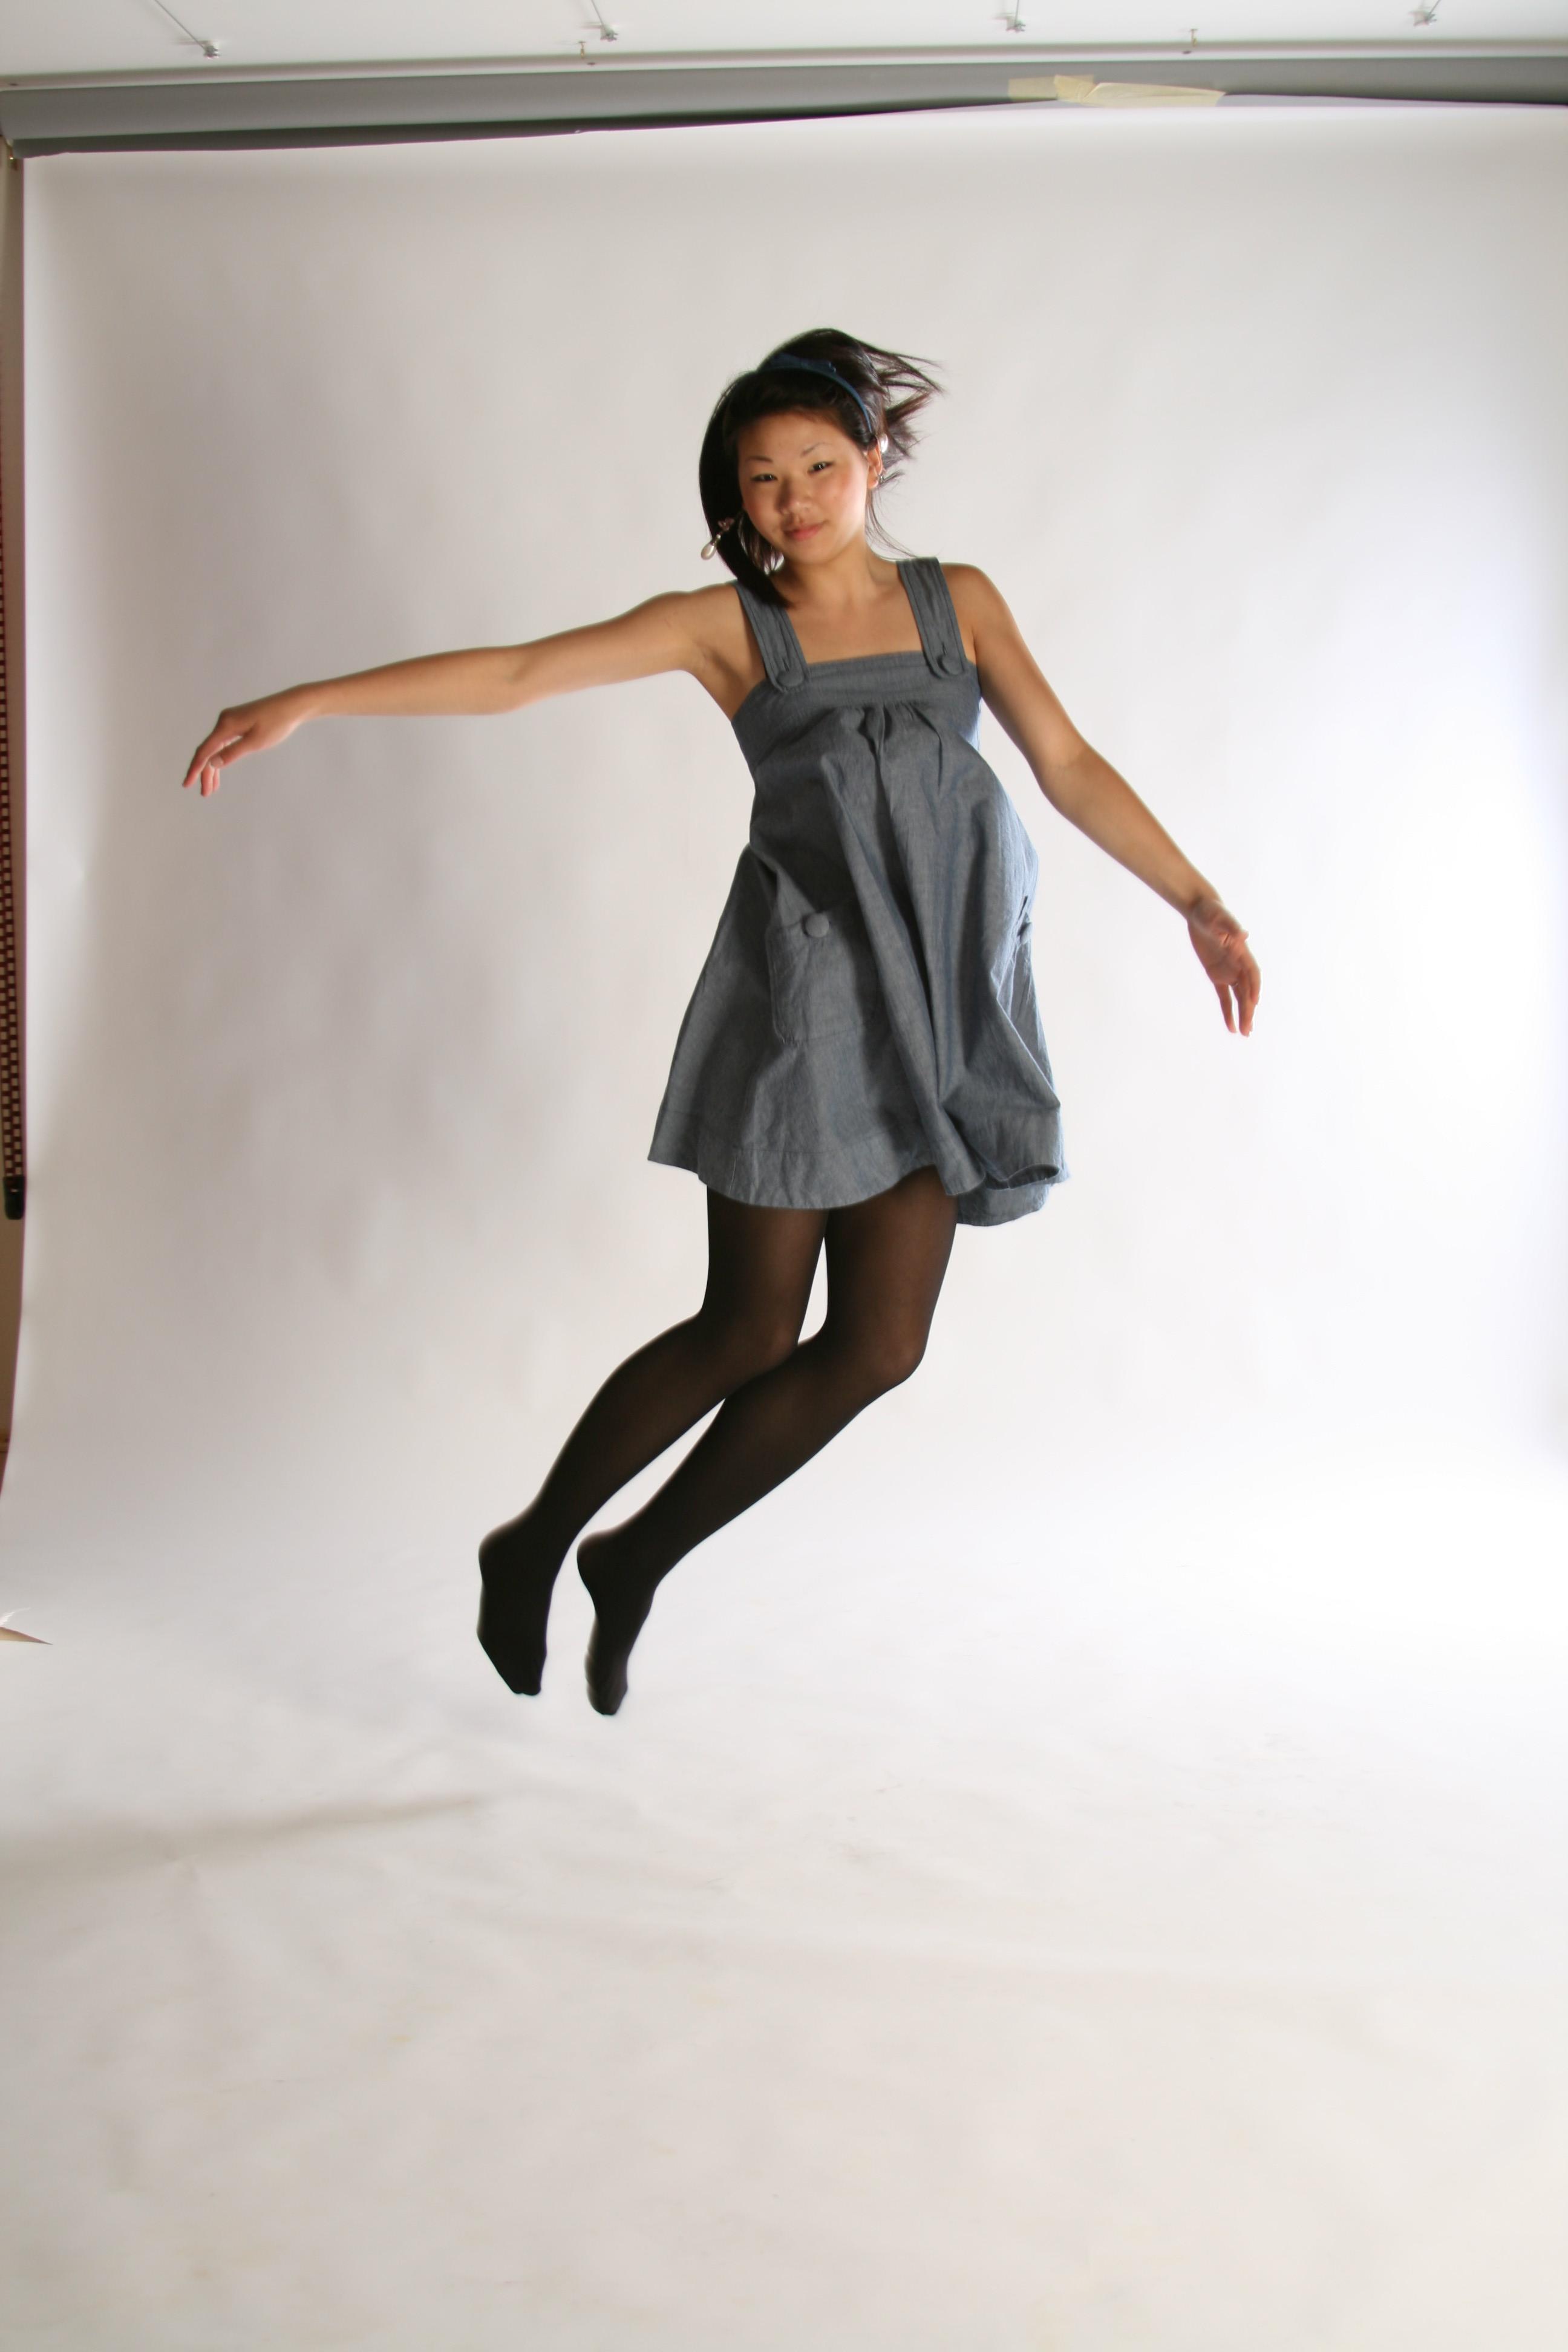 jump1 by freestockswirls